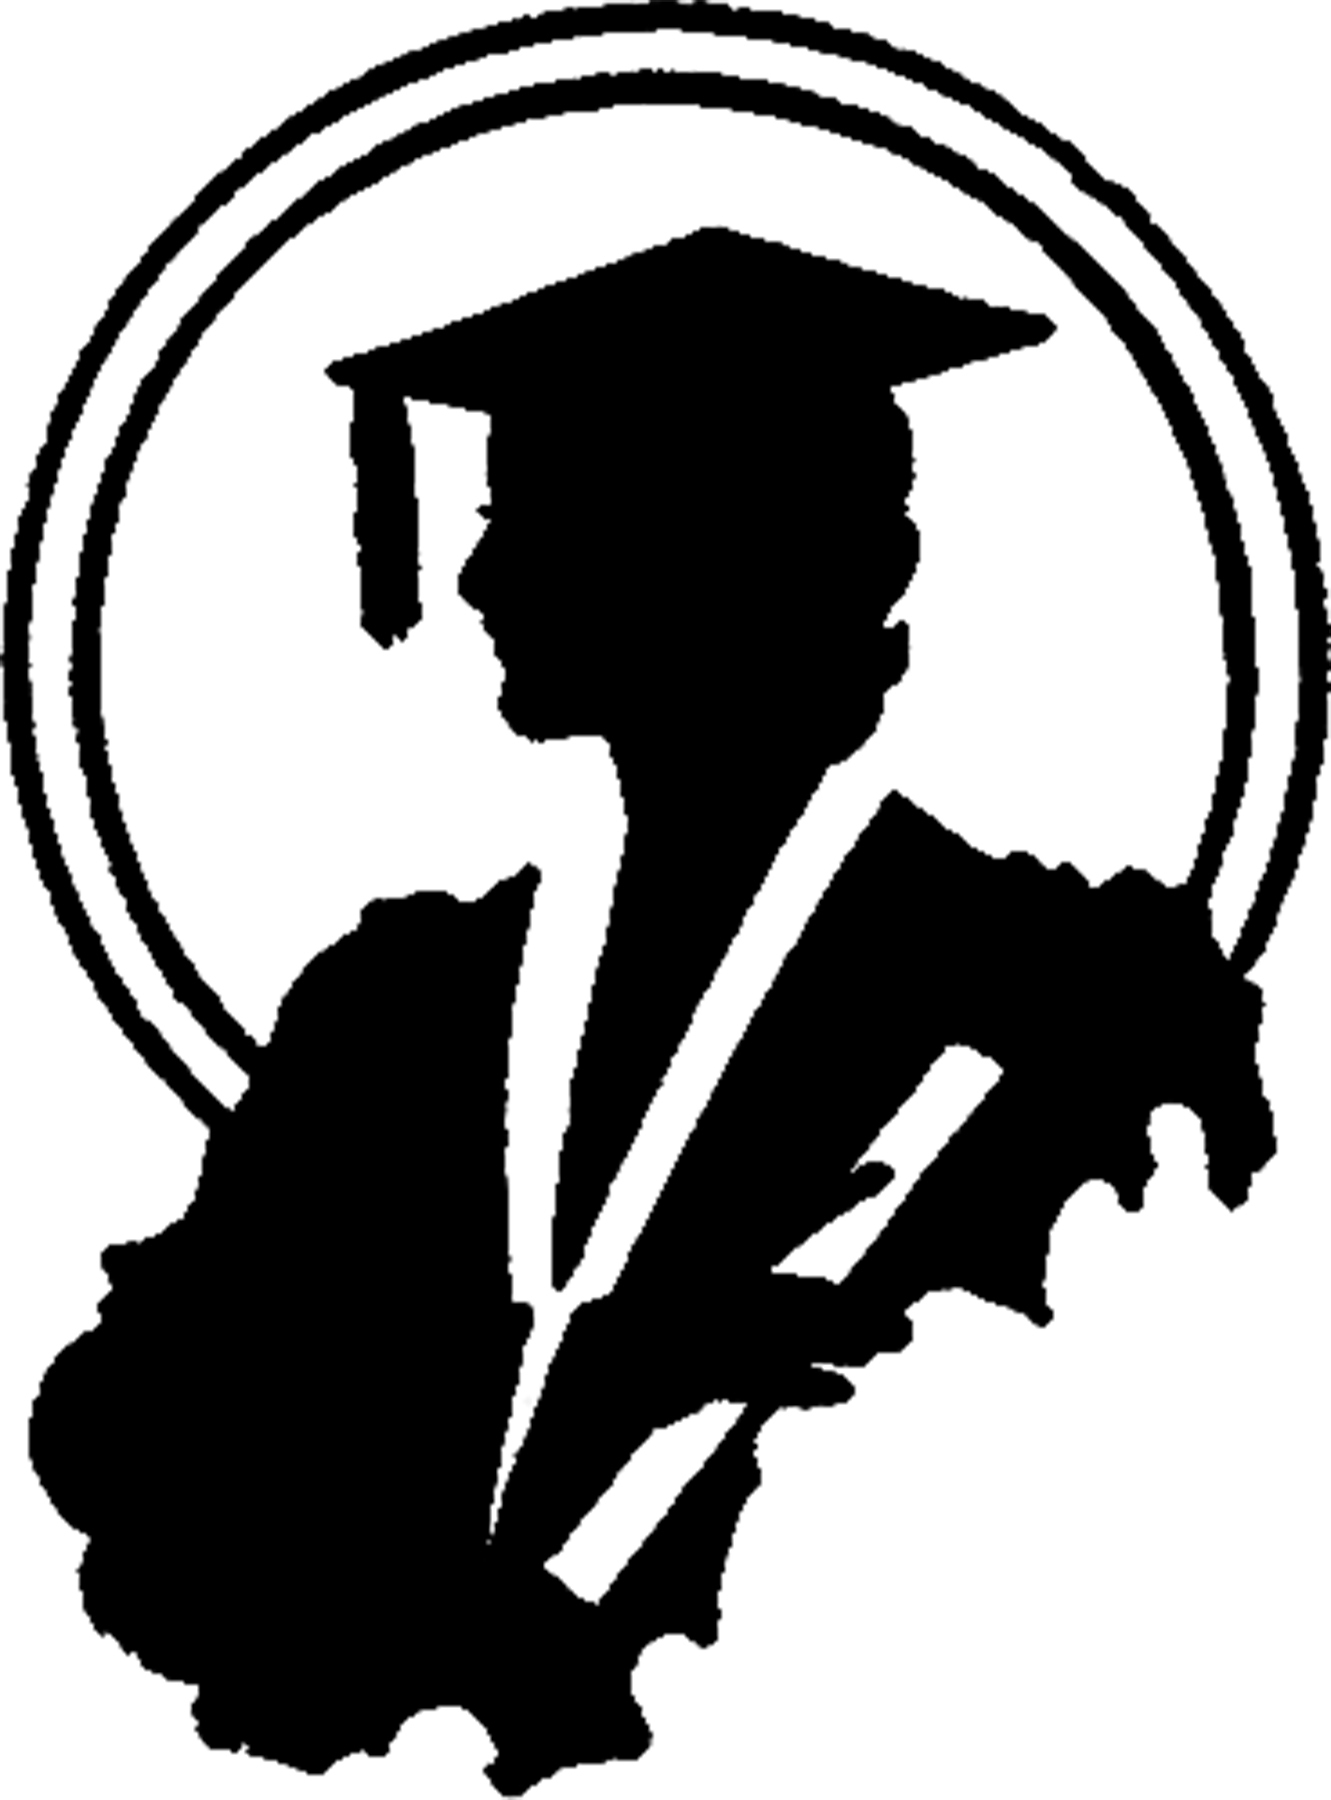 Silhouette Graduation Cap at GetDrawings com | Free for